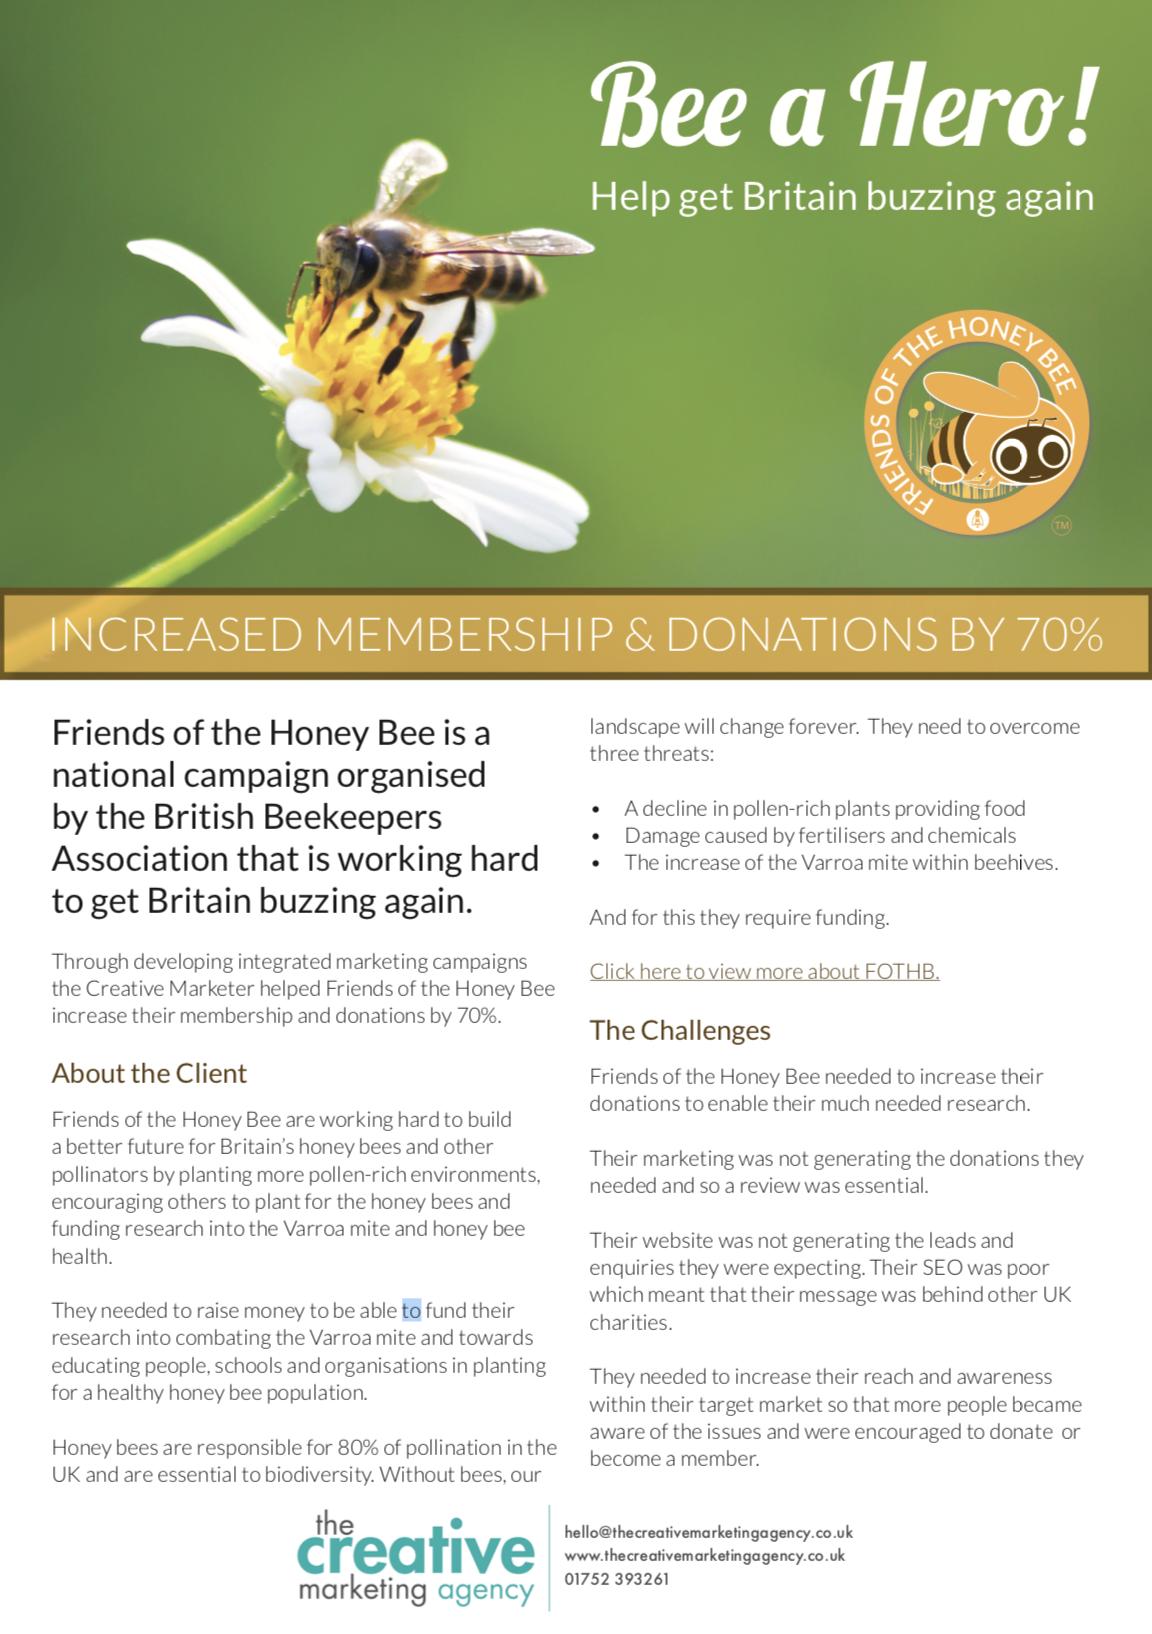 Friends of the Honey Bee marketing